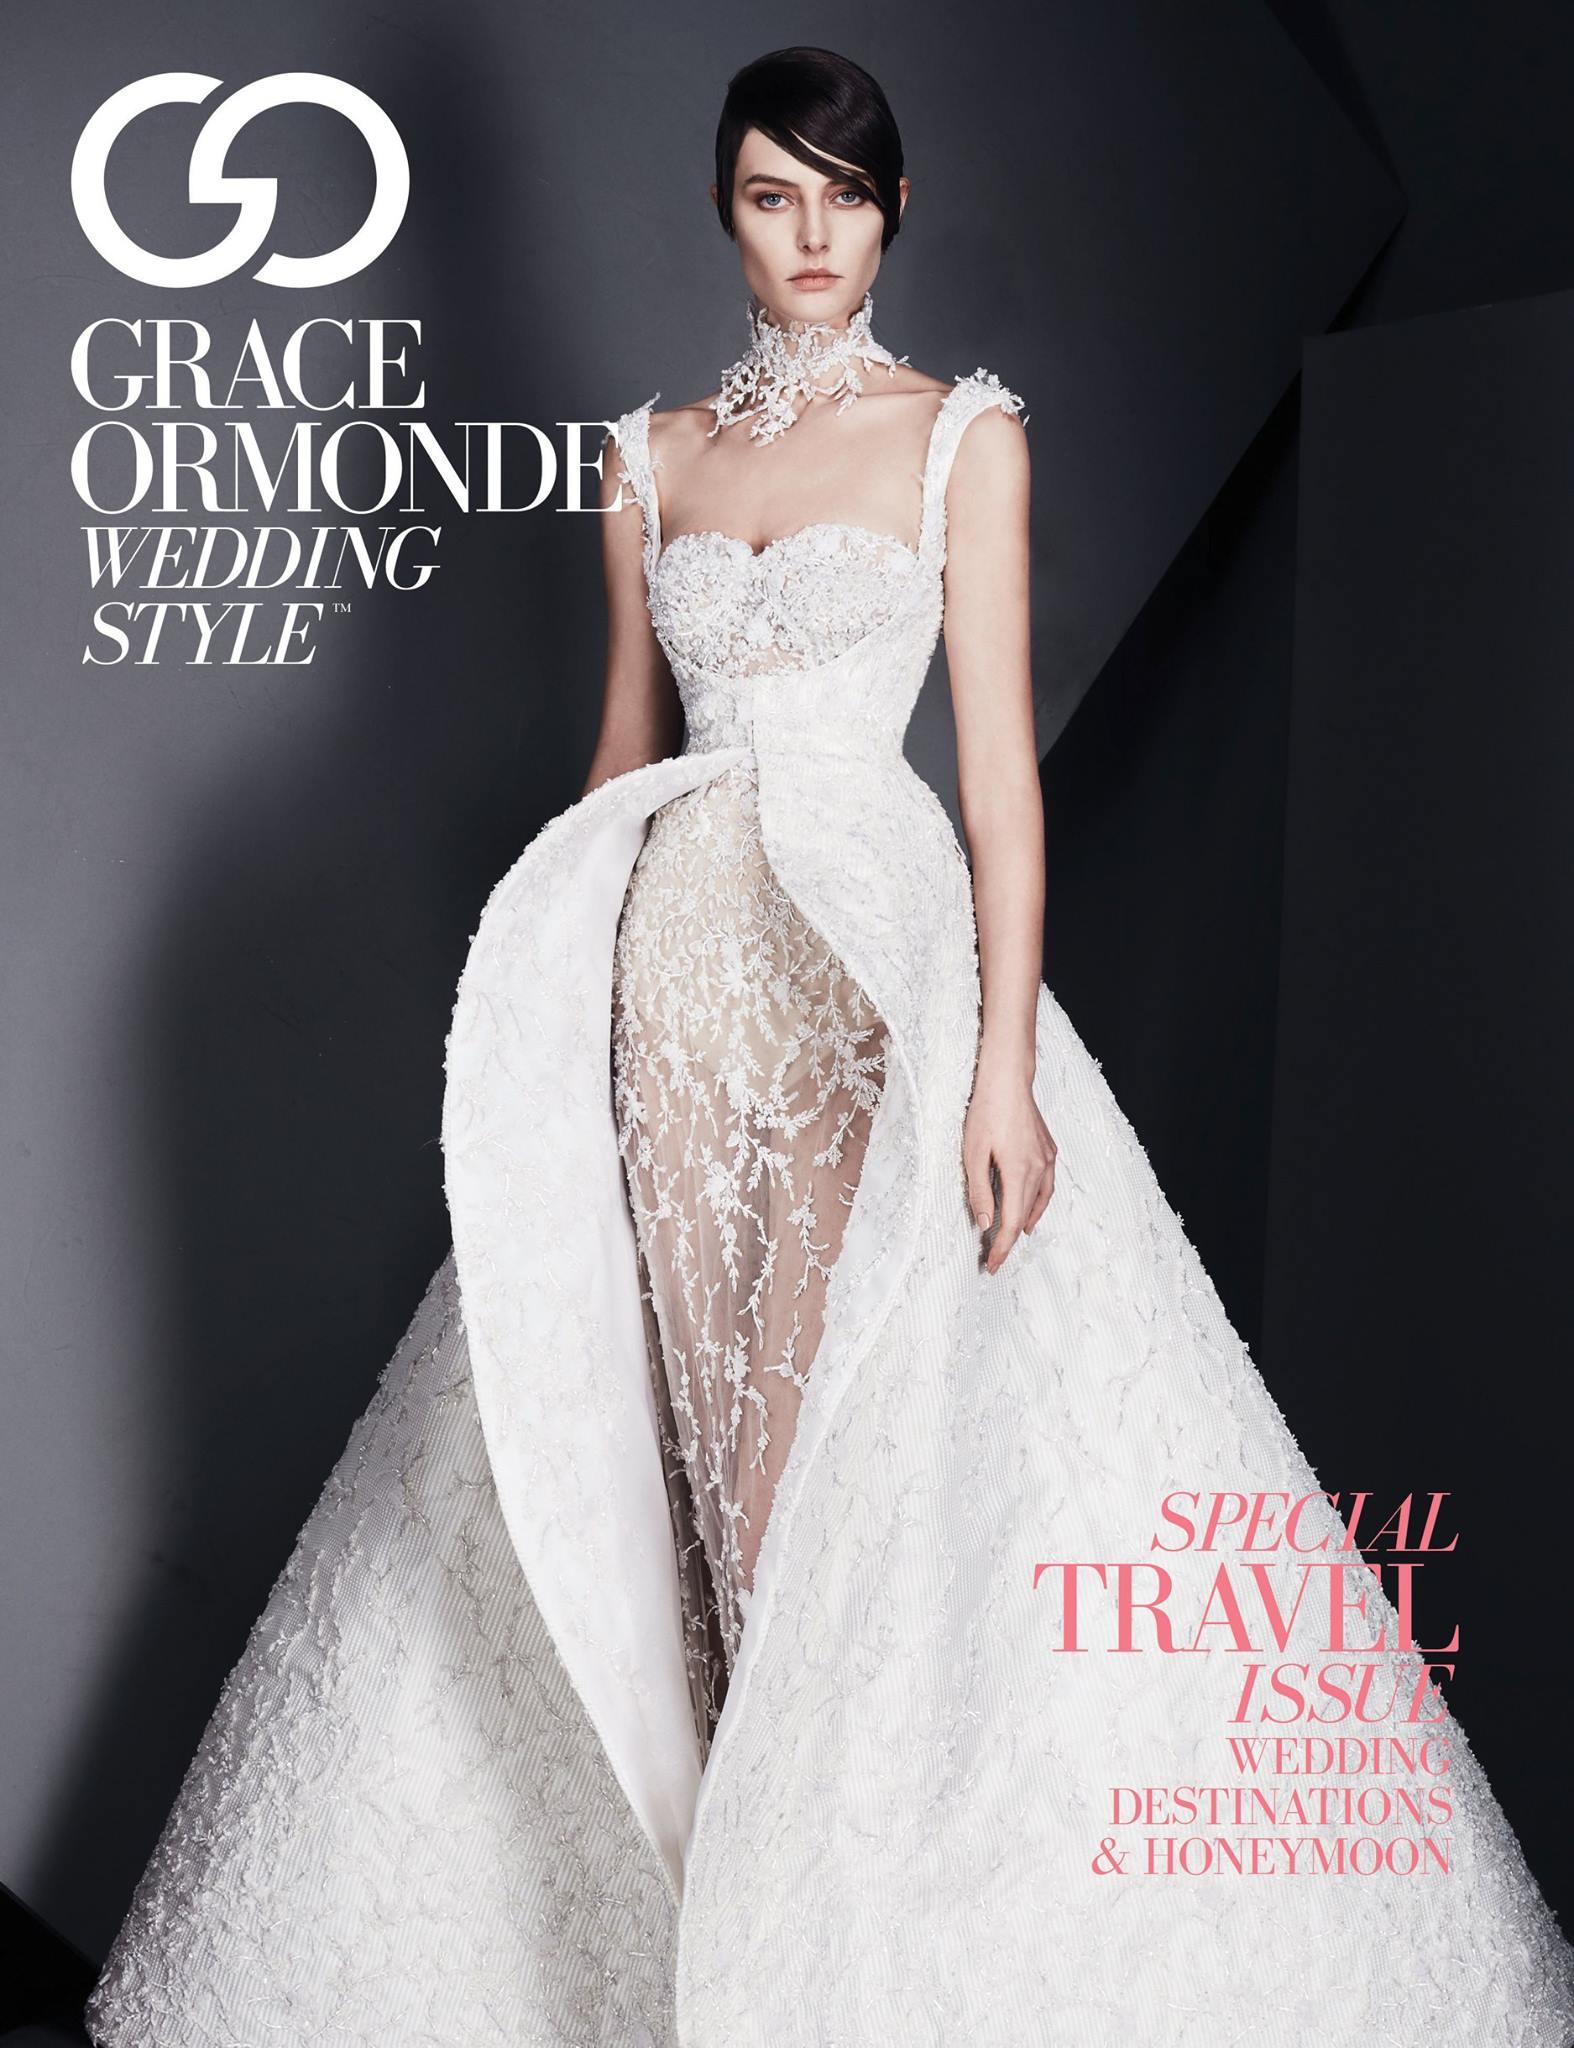 Grace Ormonde Wedding Style 2017